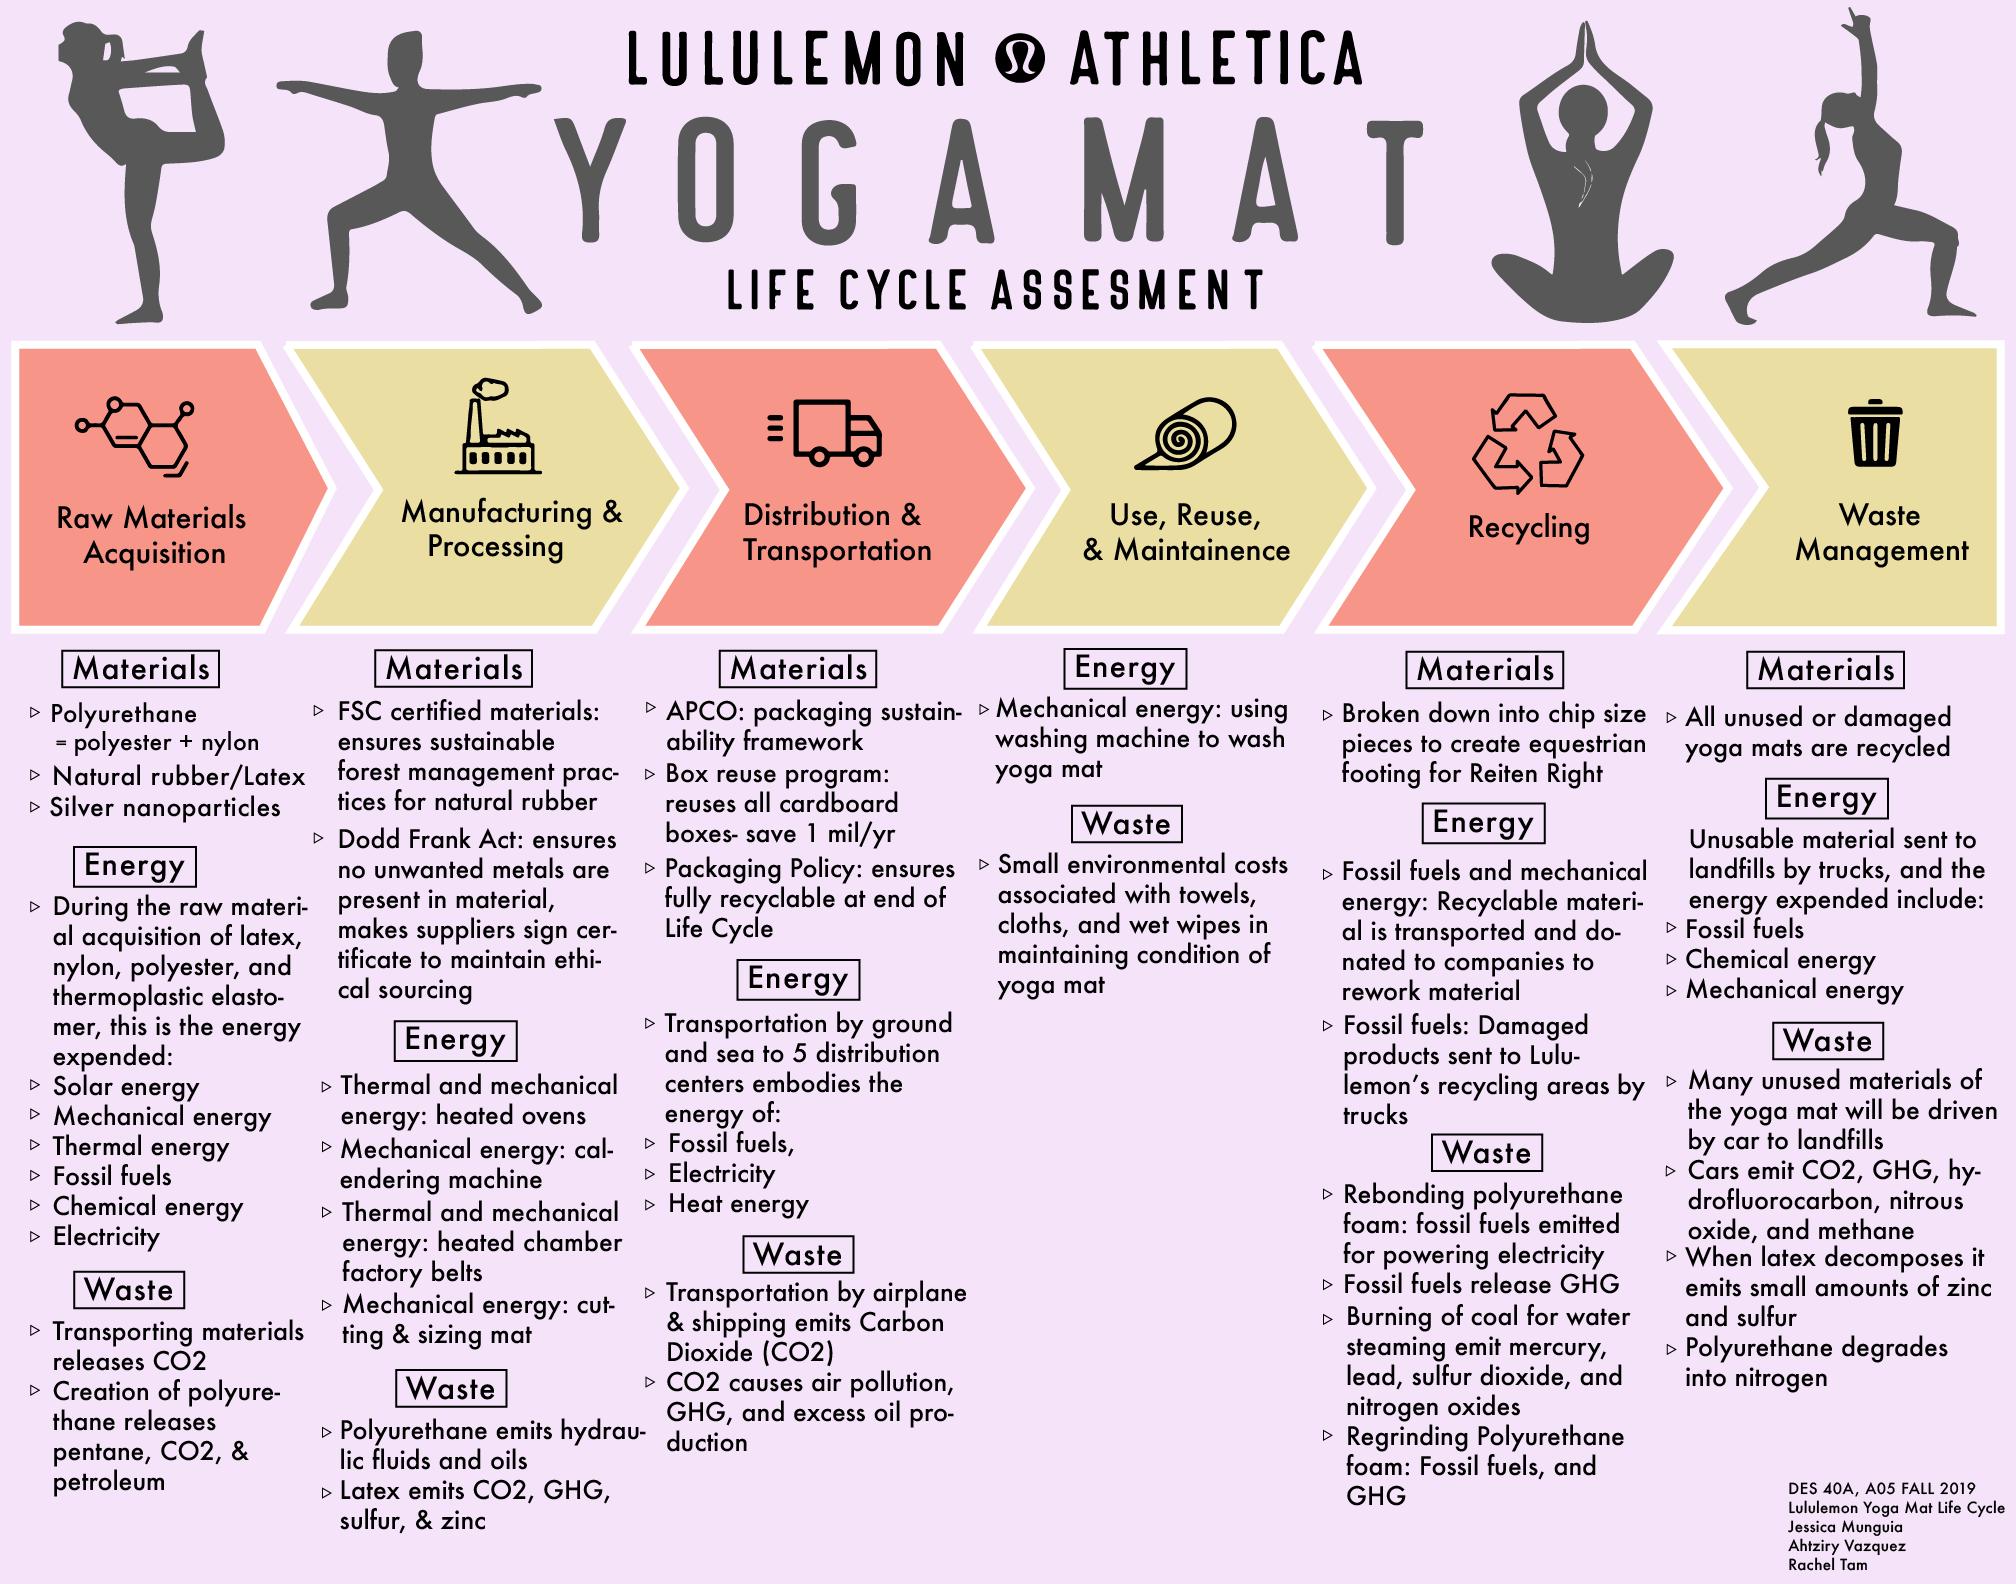 Lululemon Yoga Mat Design Life Cycle